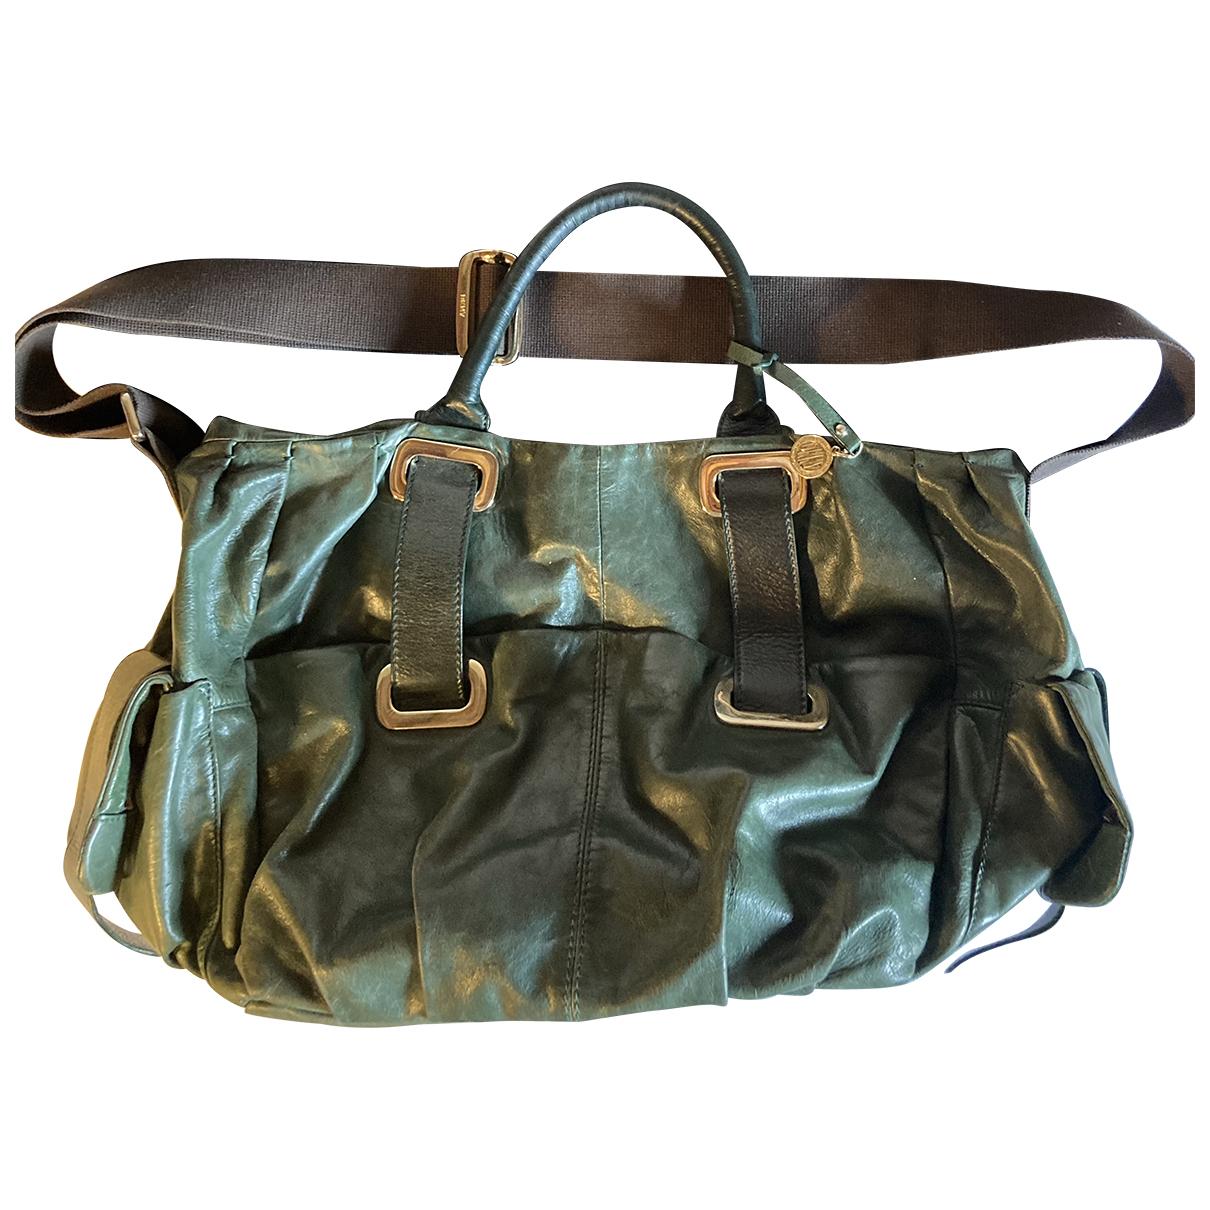 Dkny N Green Leather handbag for Women N